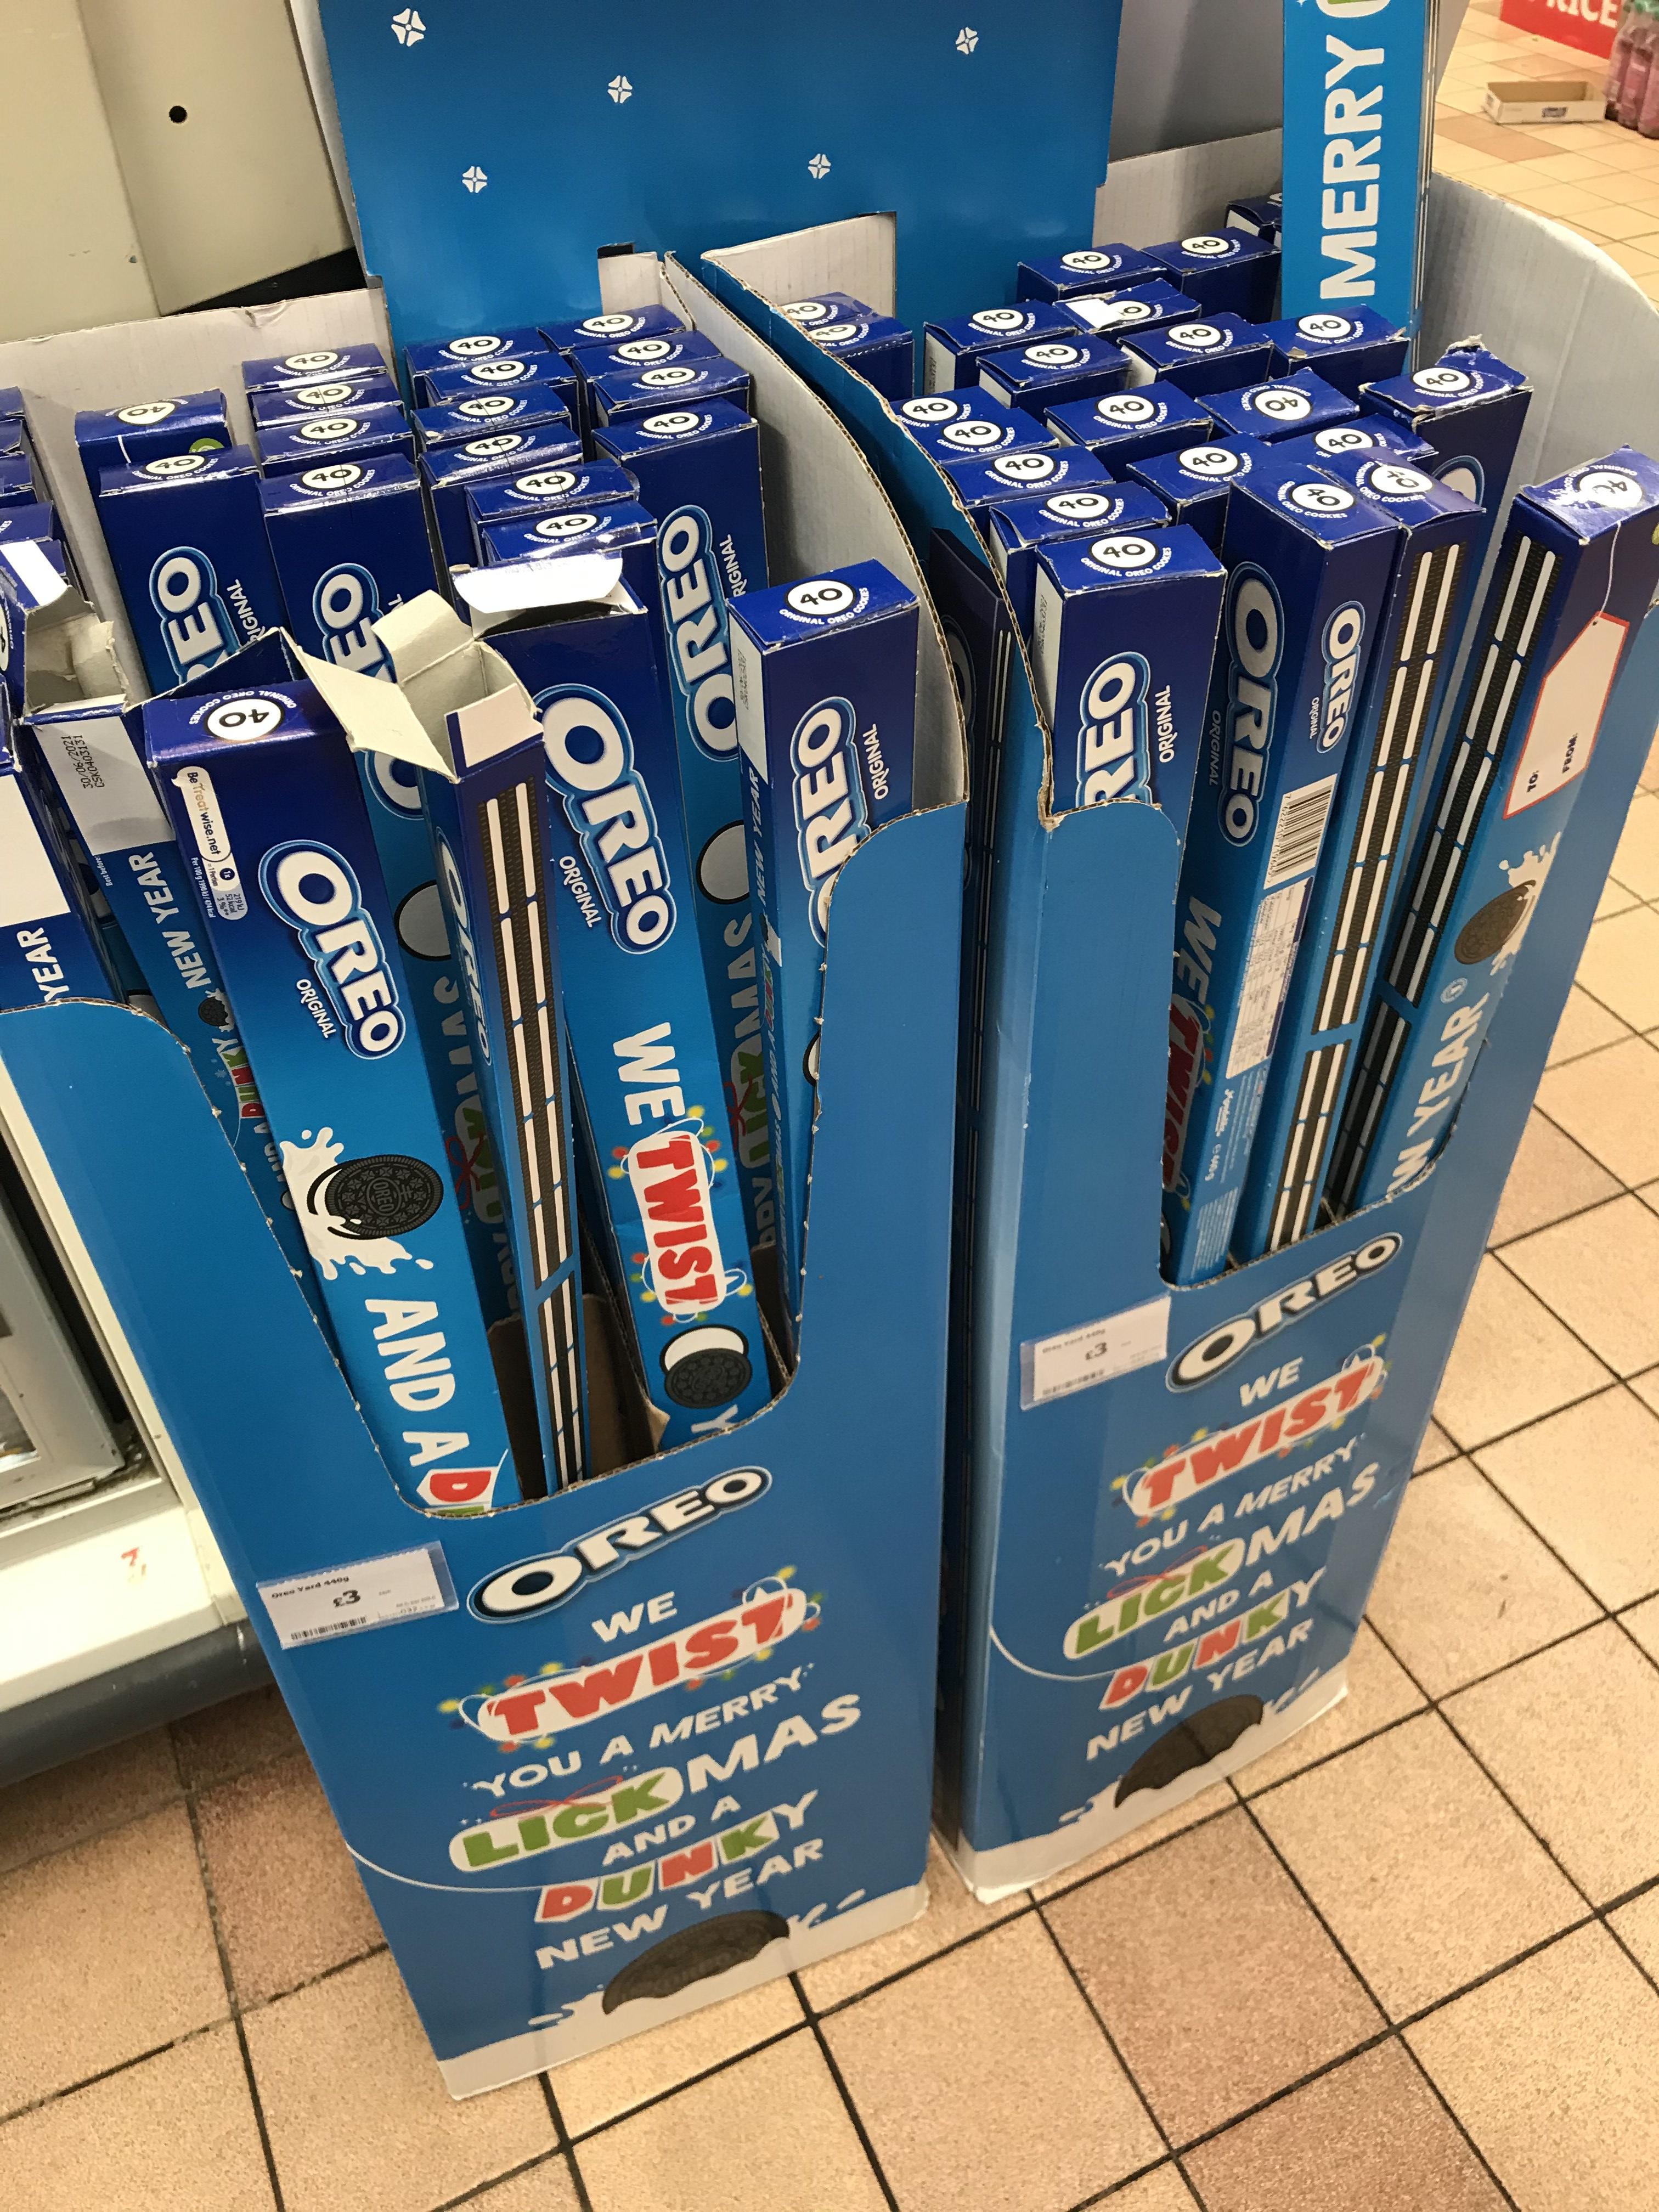 Oreo tube 440g for £3 at Sainsbury's East Ham